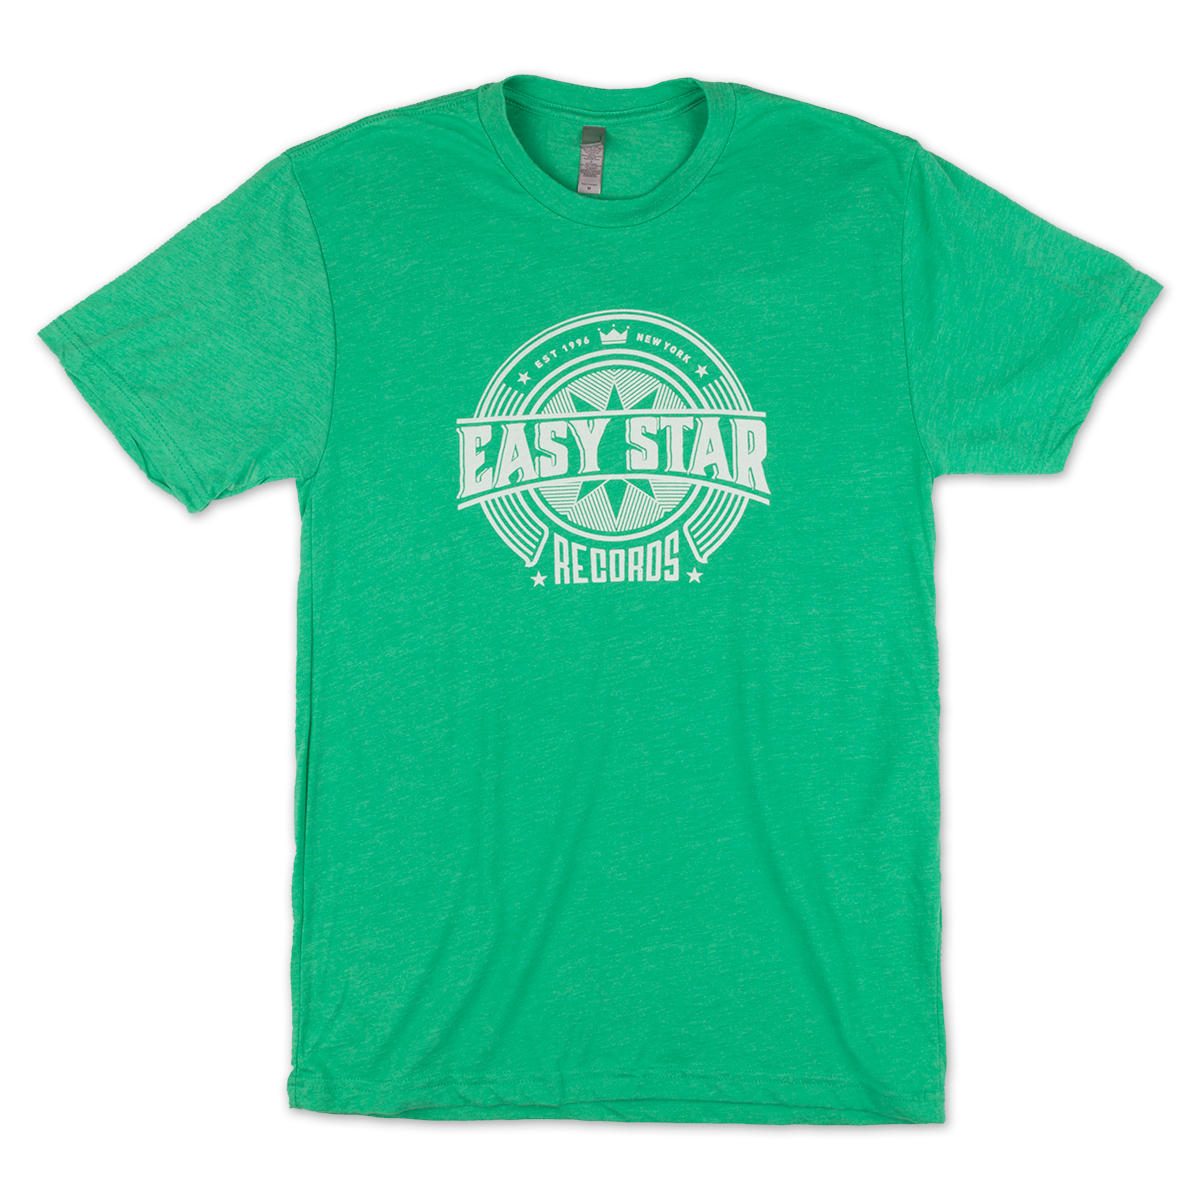 Easy Star Records Circle Logo Green Tee Shirt